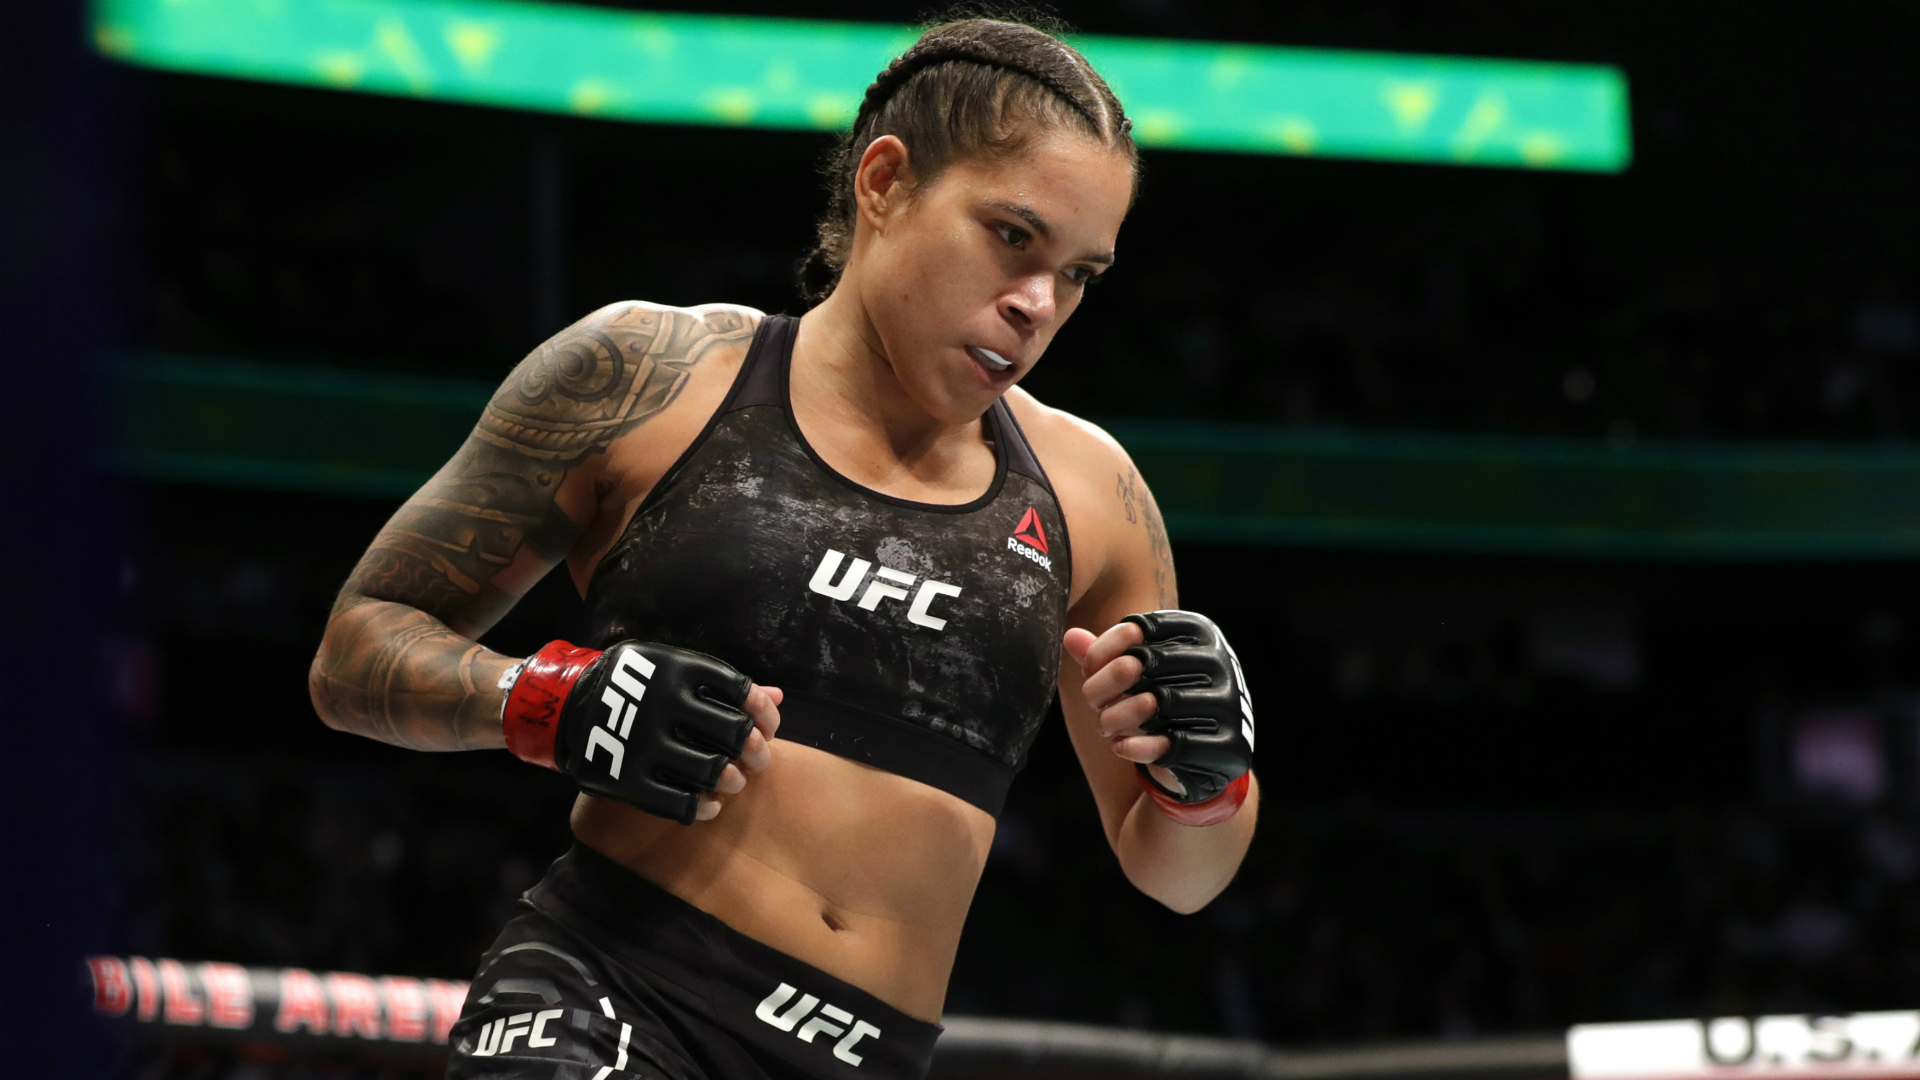 UFC 250: Amanda Nunes outclasses Felicia Spencer, makes history; Cody Garbrandt celebrates devastating return 1